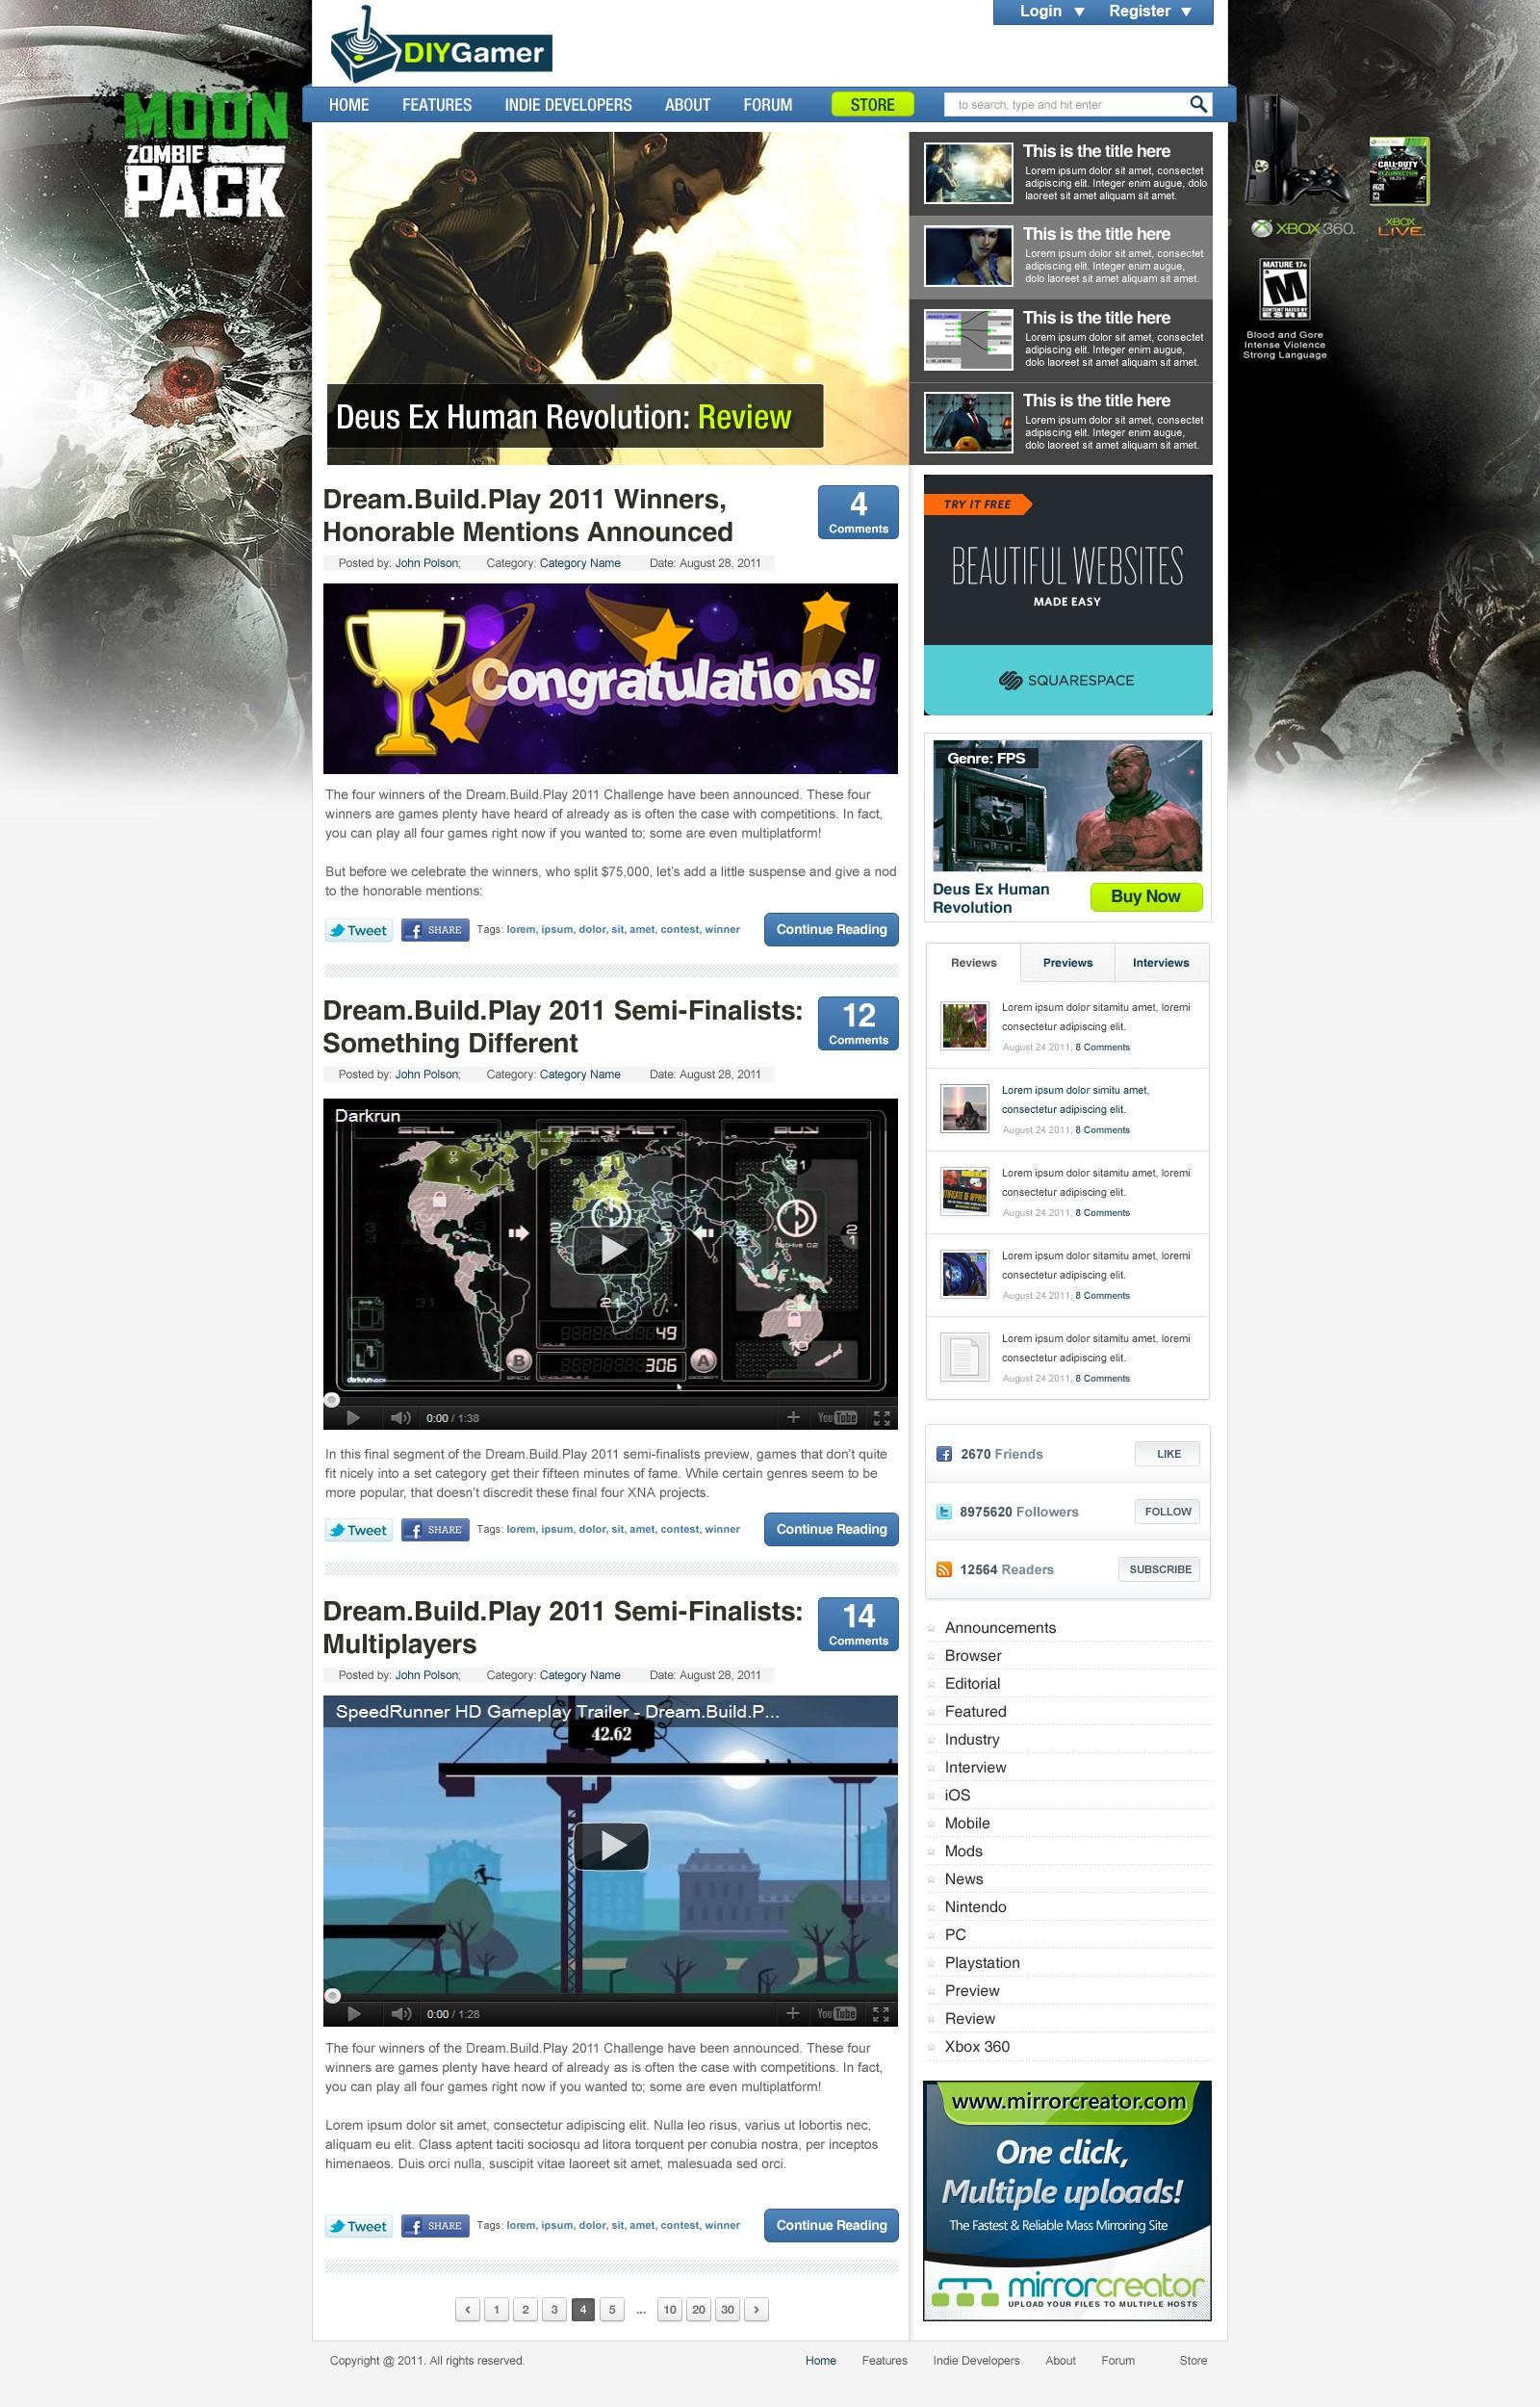 DIYGamer.com, a large video game blog, needs a streamlined design